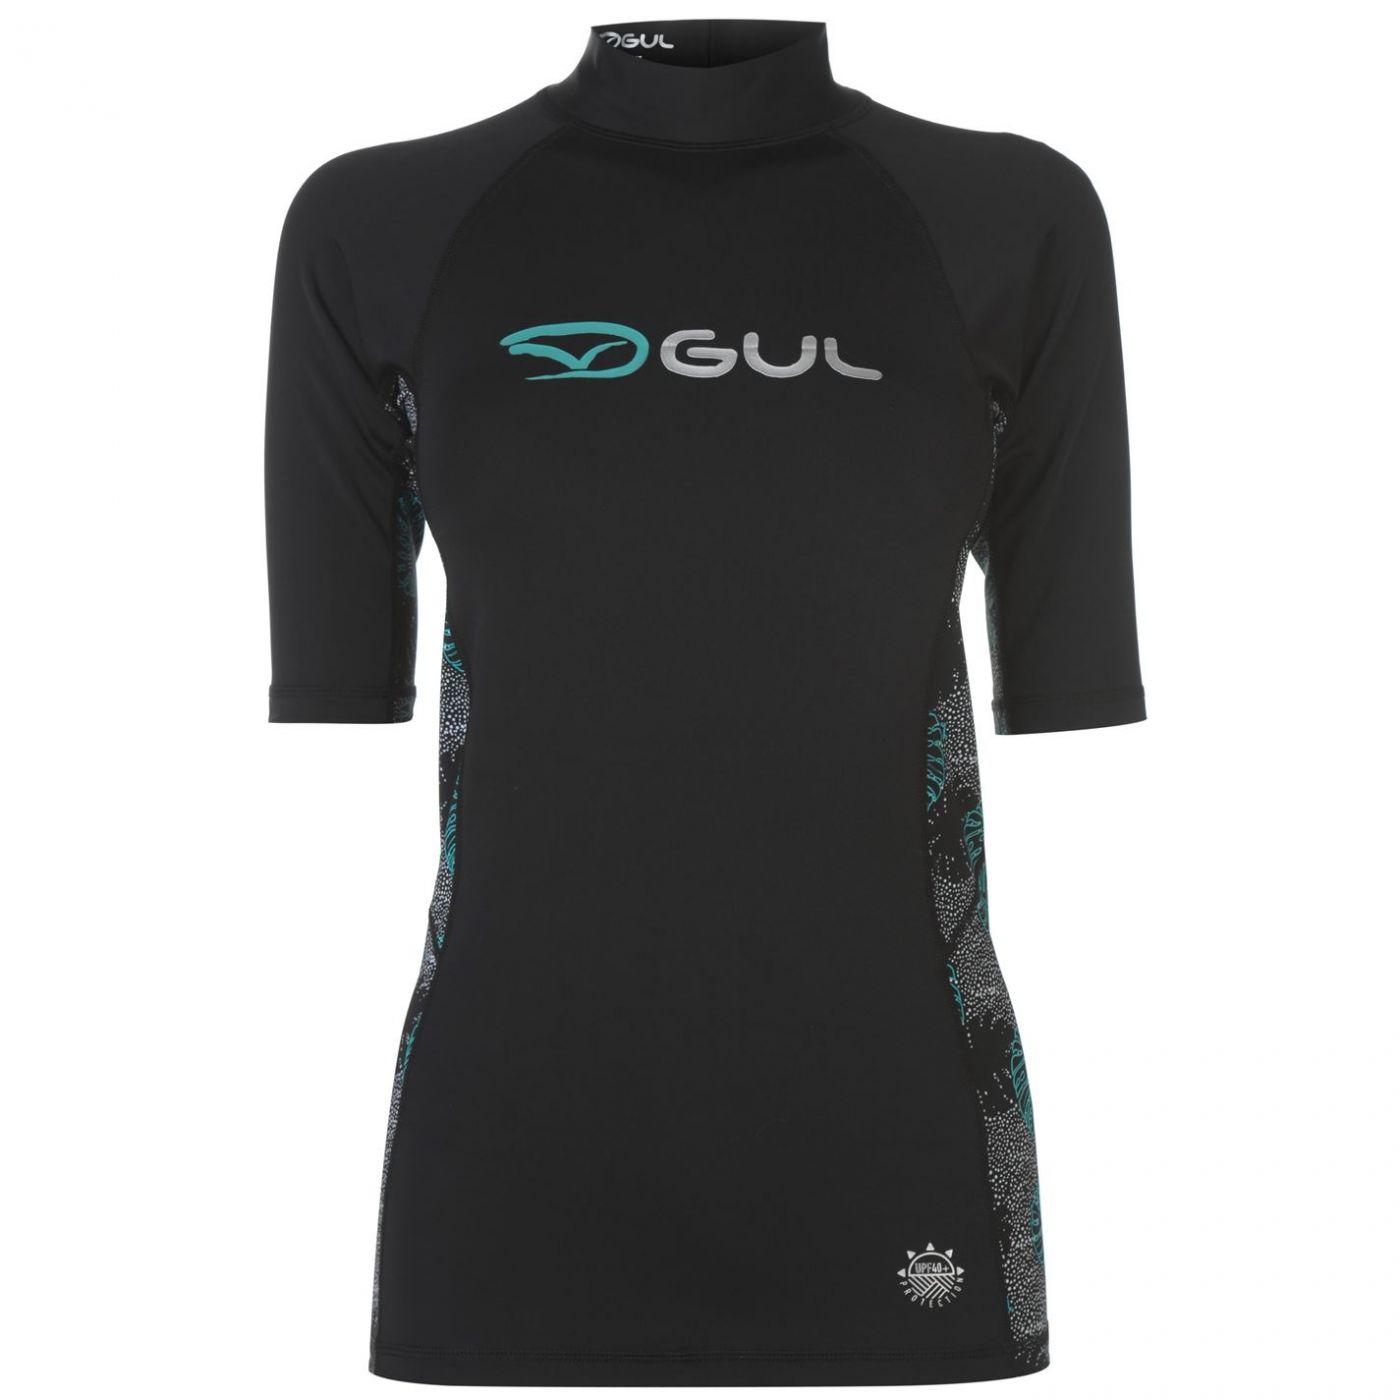 Gul Short Sleeve Rash Vest Ladies